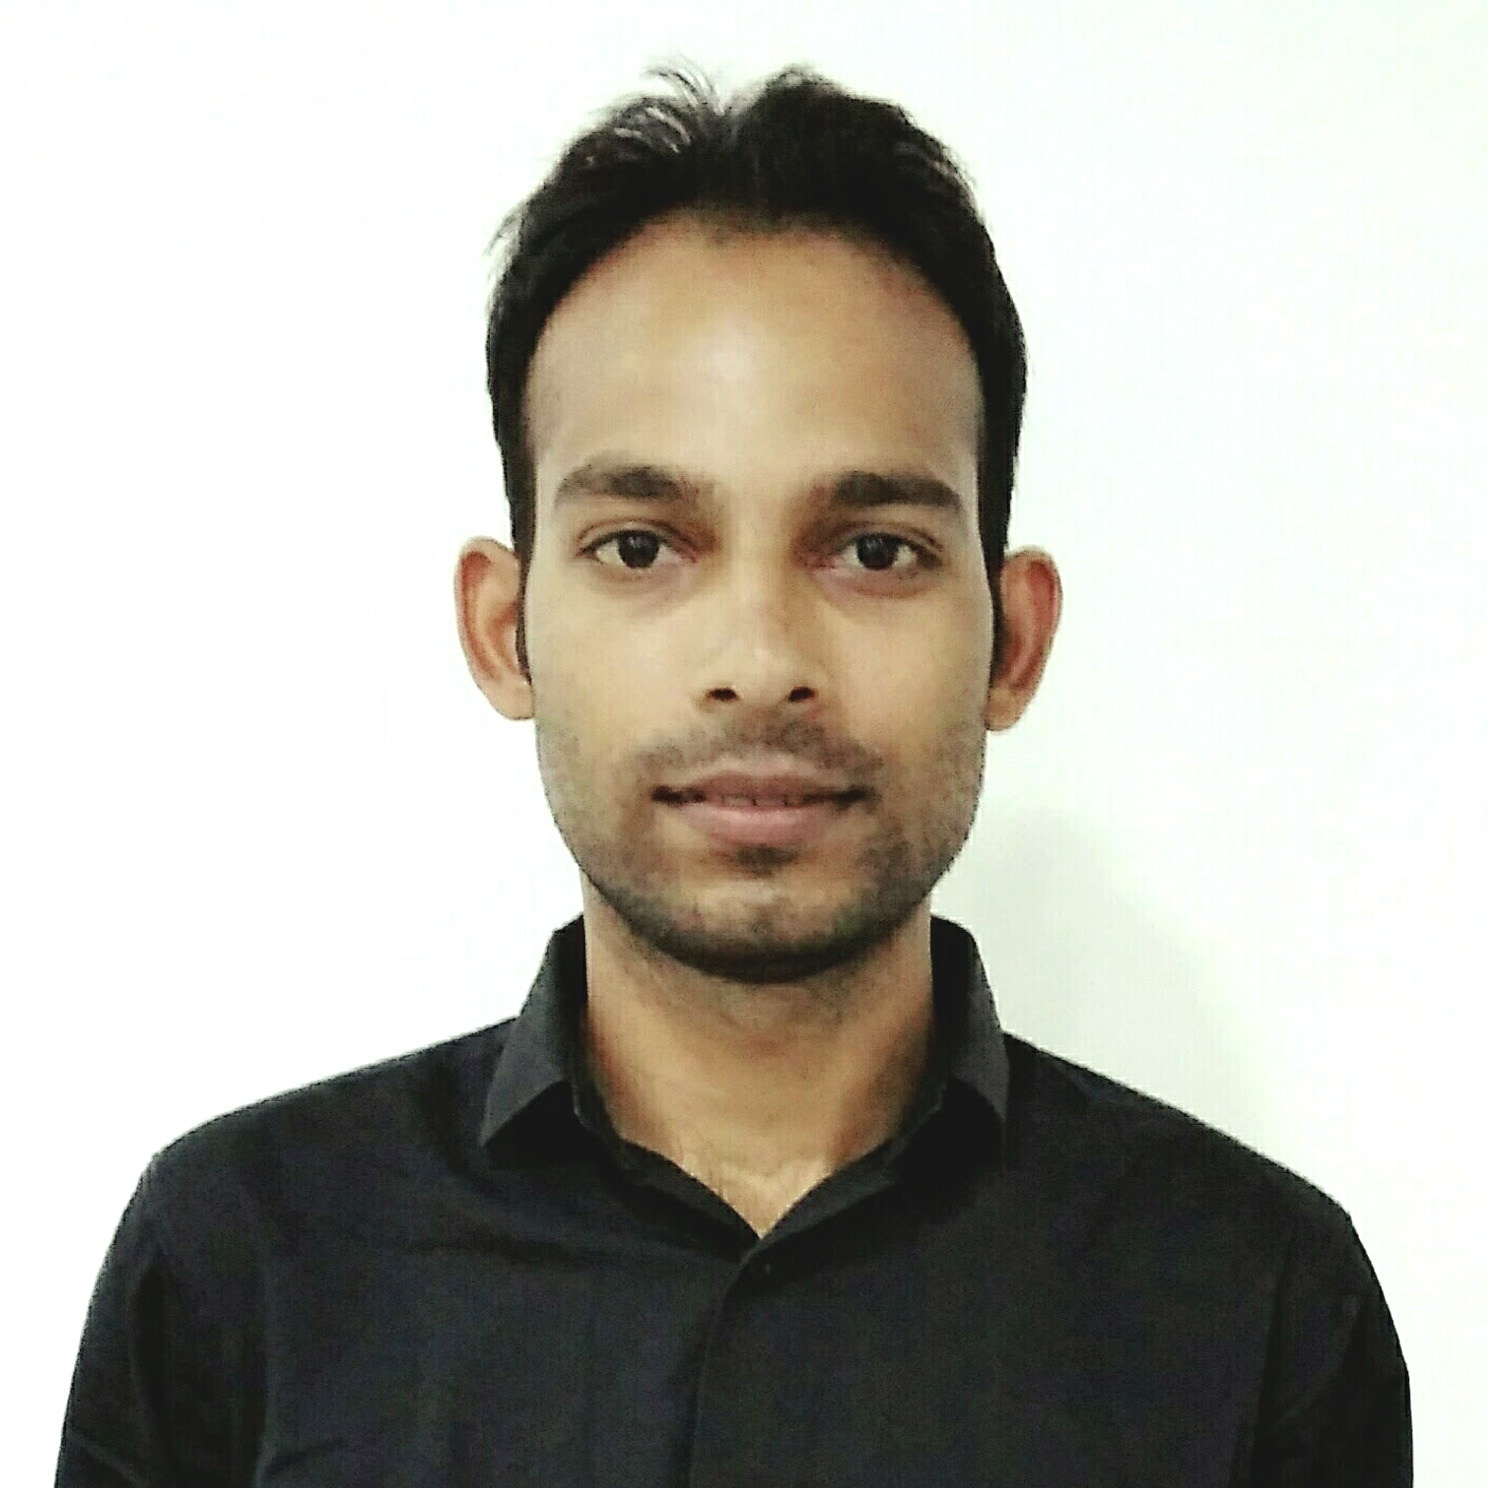 https://coretechies.com/wp-content/uploads/2020/04/Krishna-Dev-Sharma.jpg